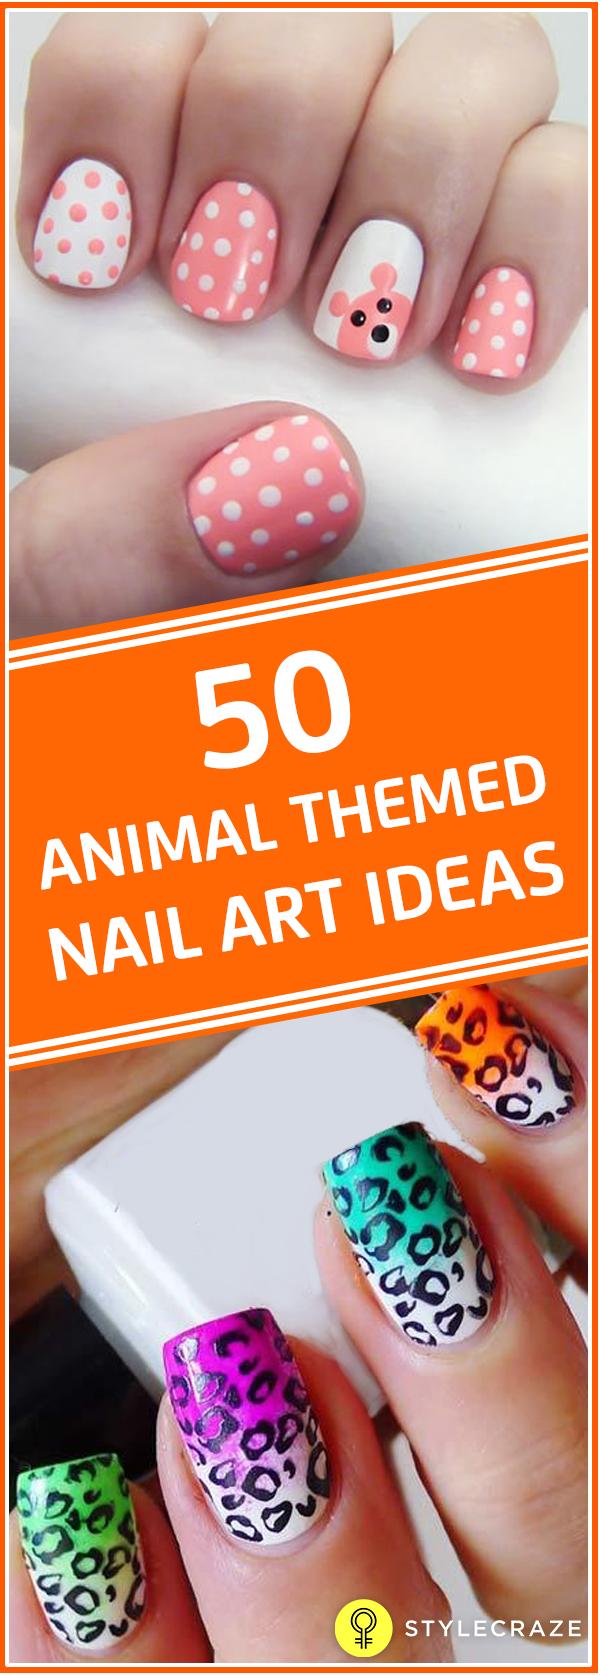 50 Animal Themed Nail Art Ideas